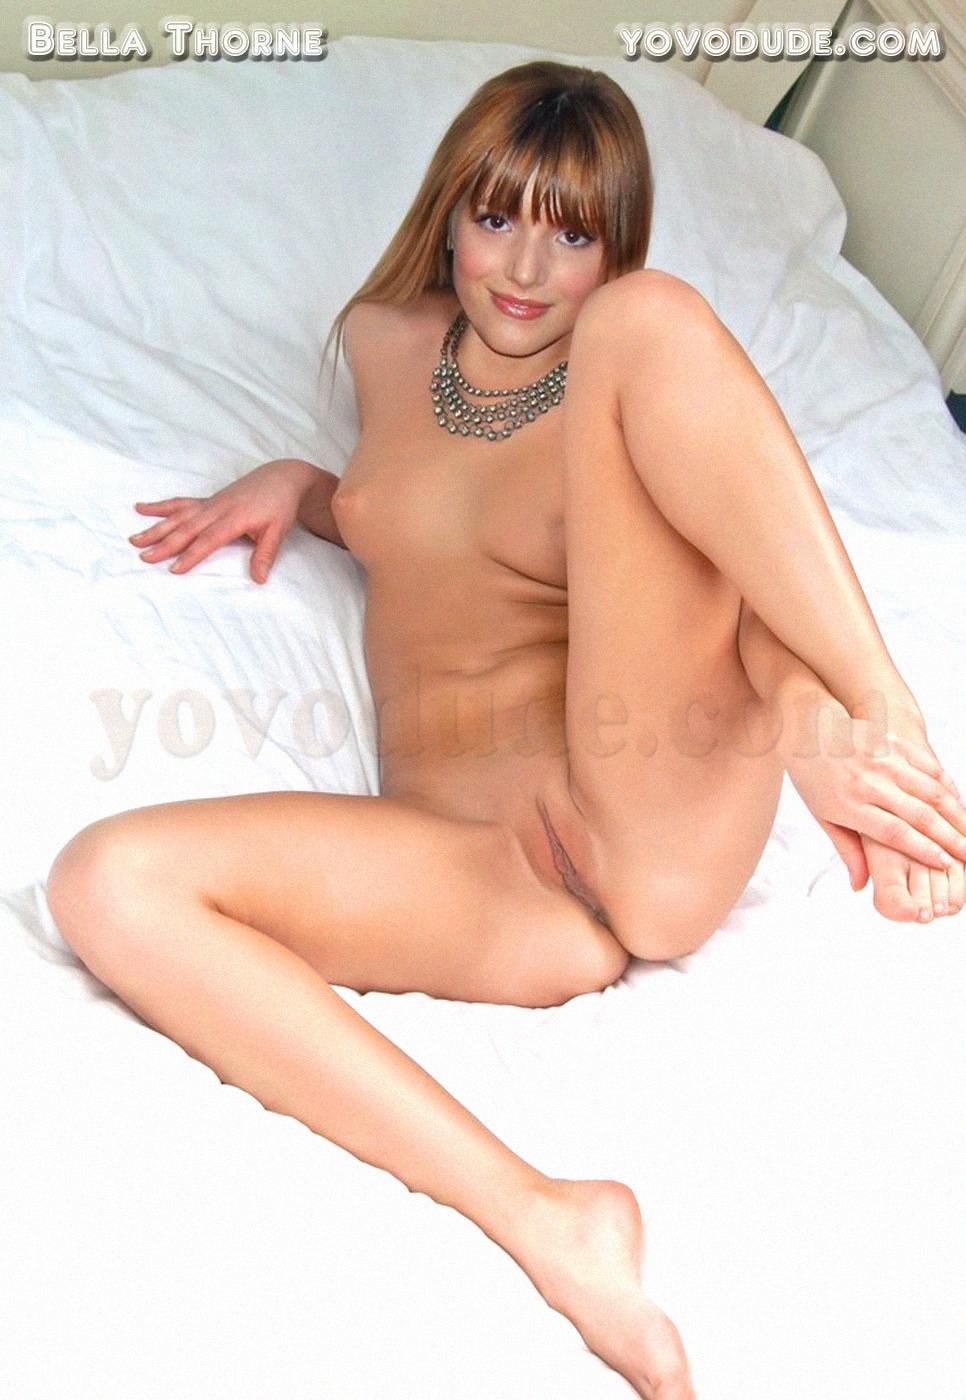 Bella Thorne Nude Fake